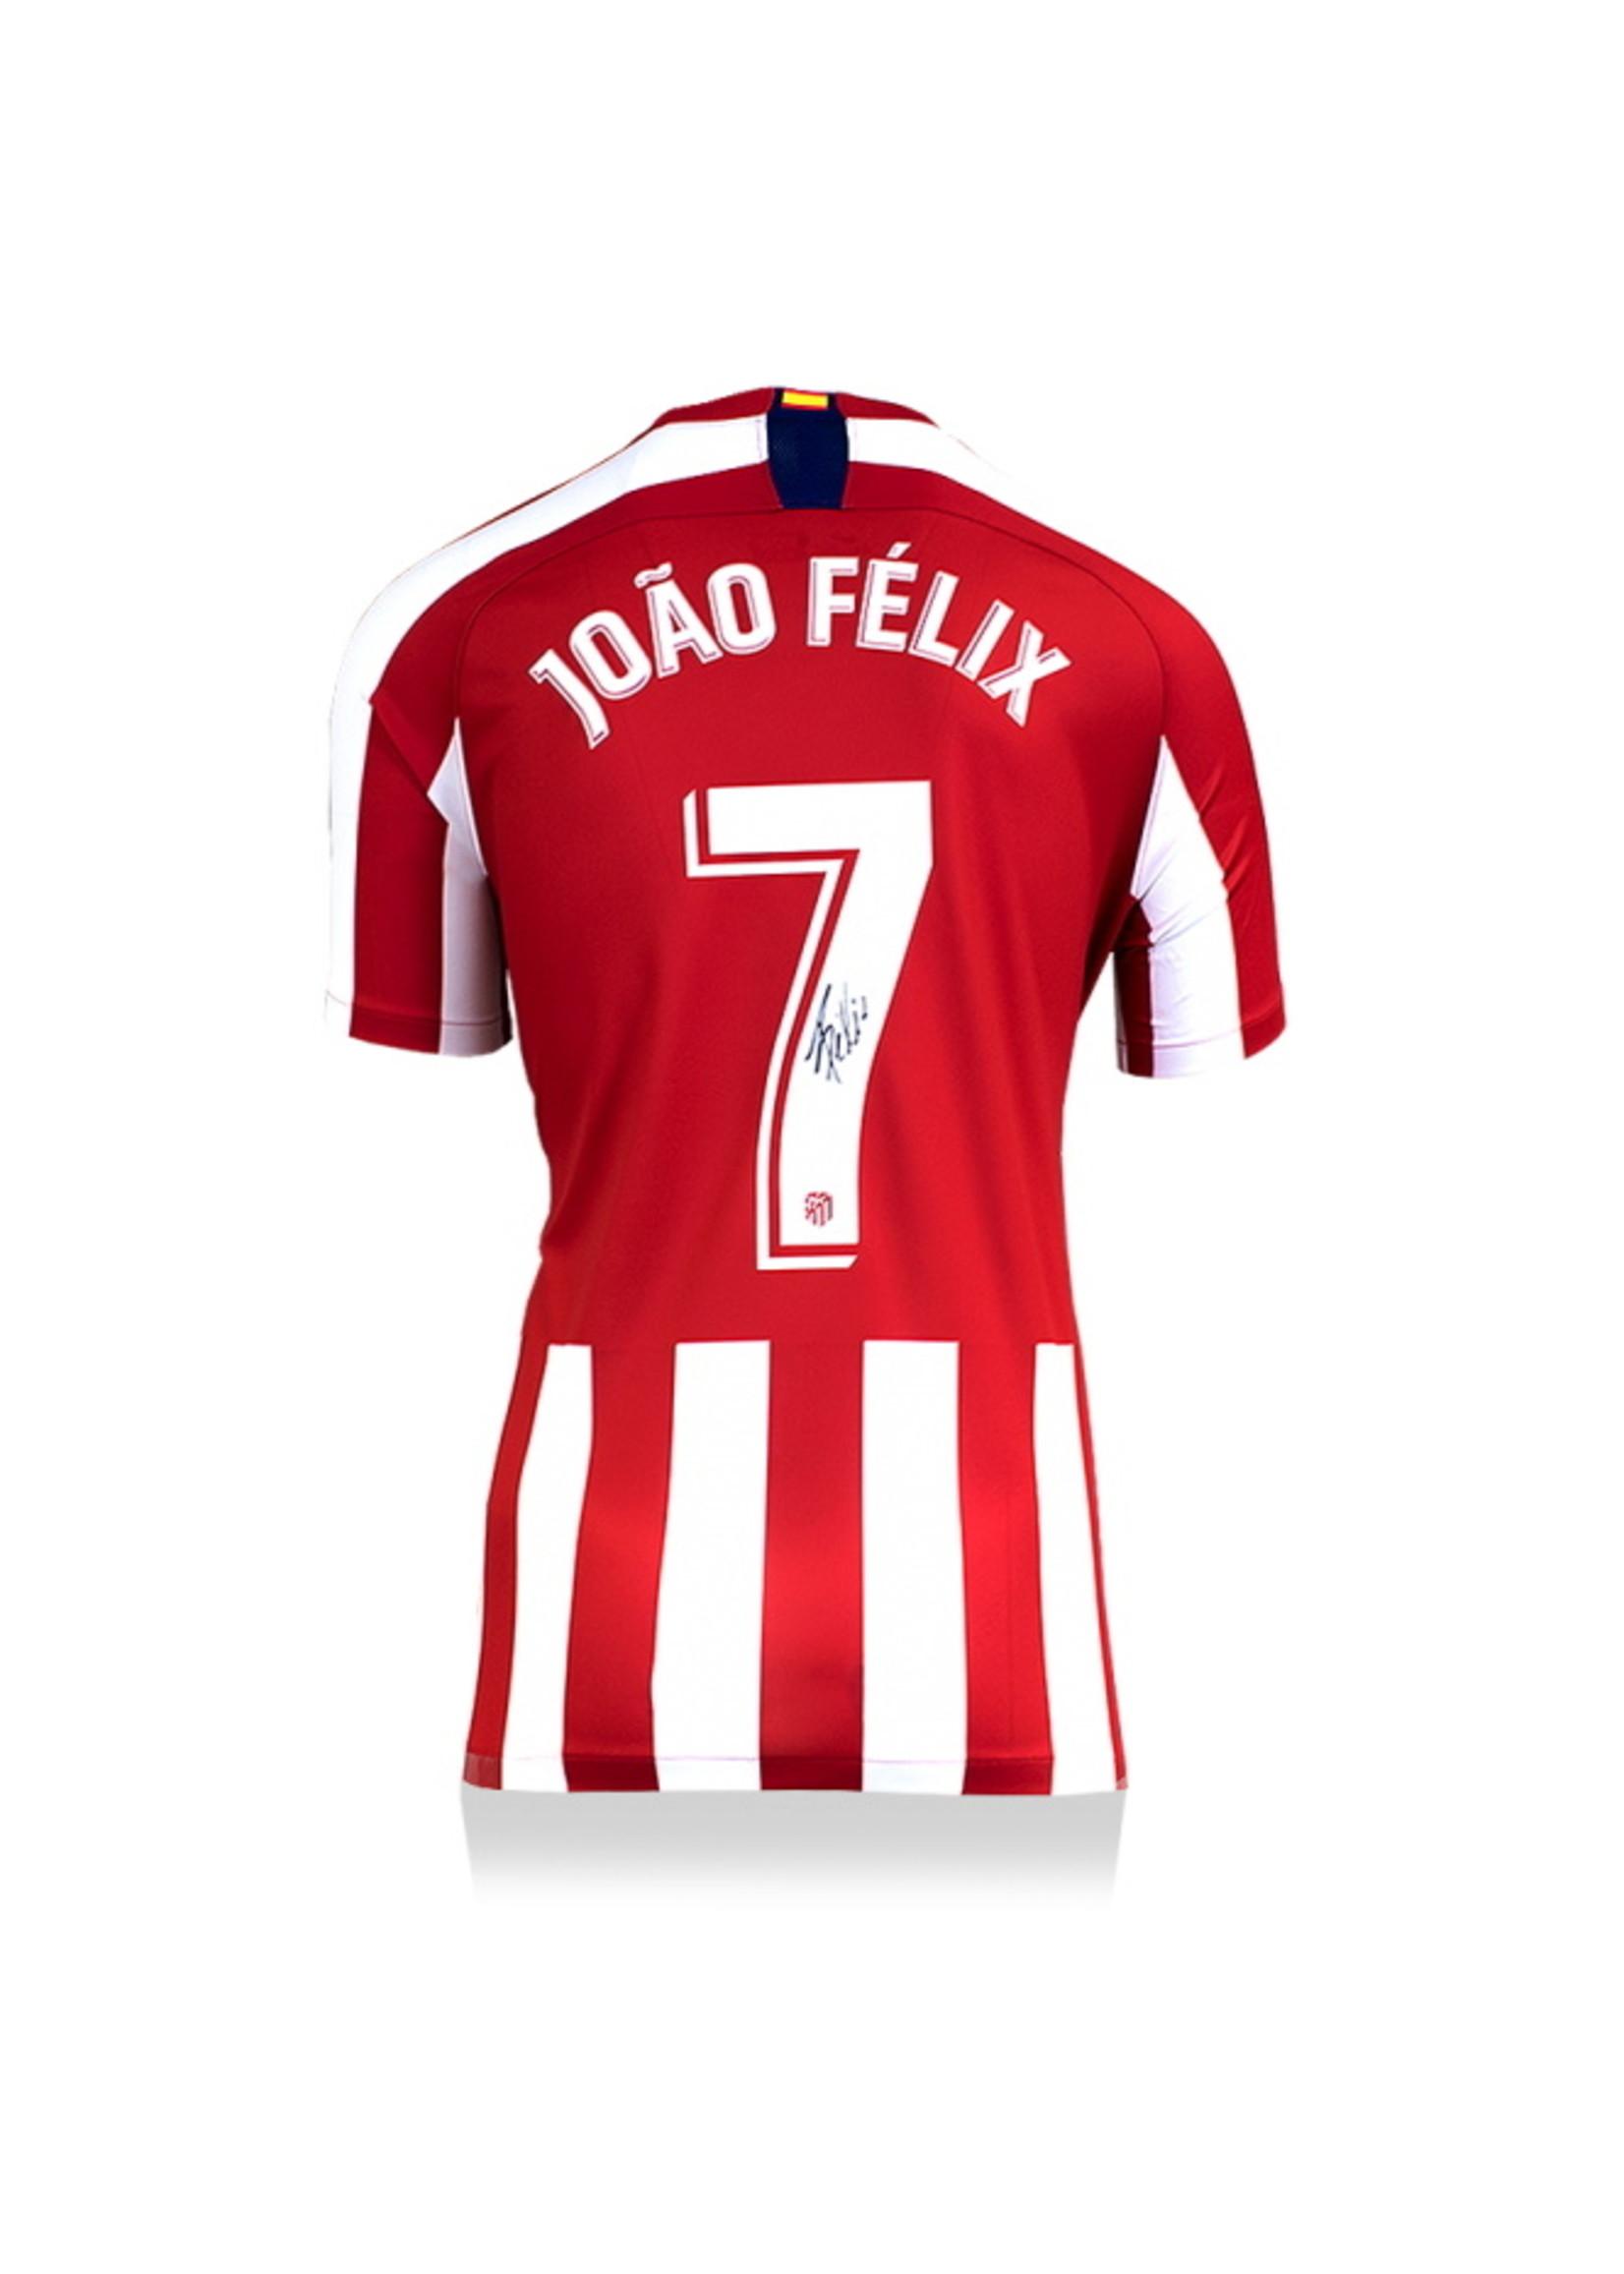 Authentic Signed Joao Felix 19/20 Atletico Madrid Jersey